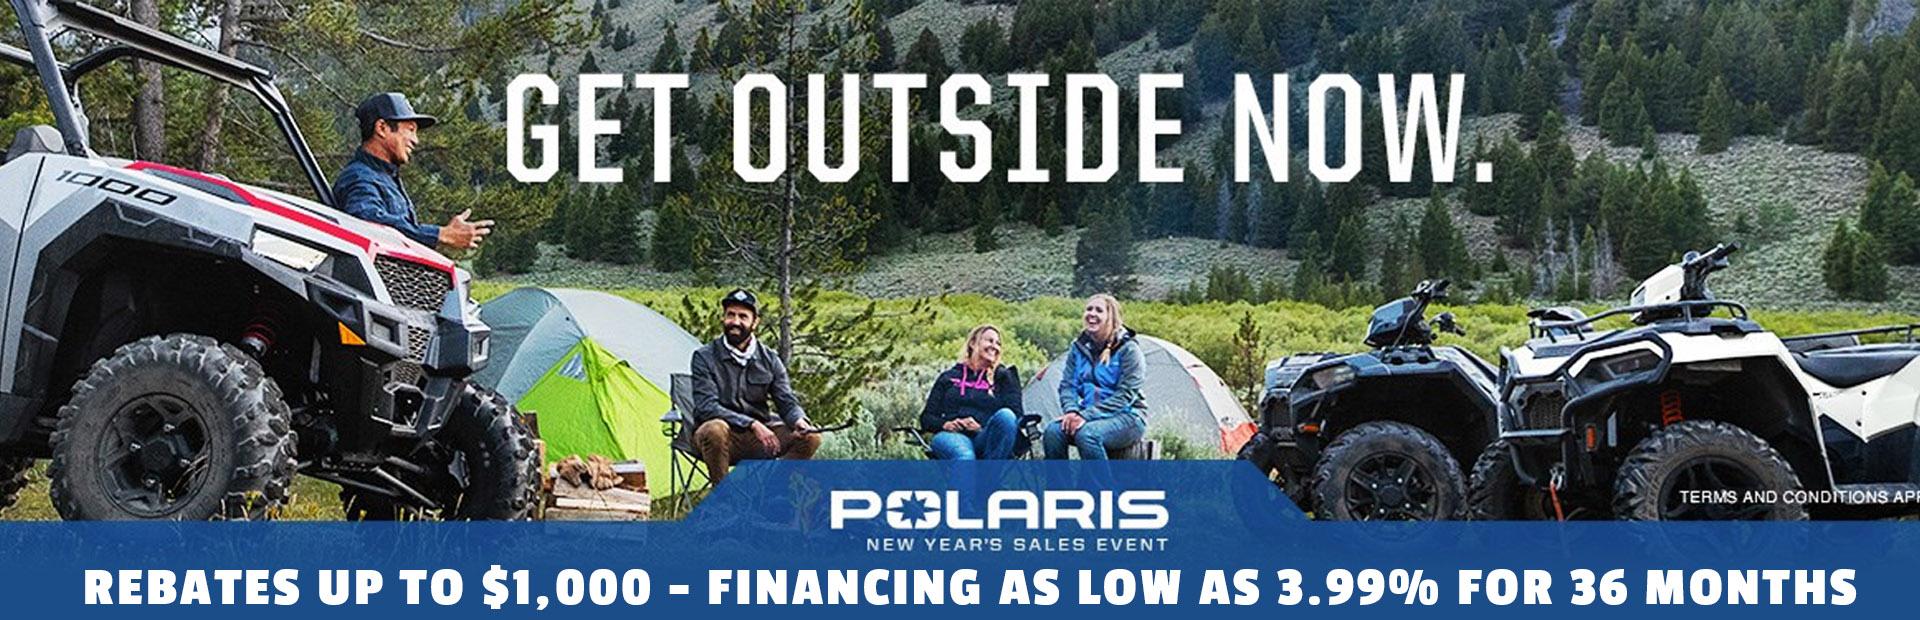 Polaris New Year's Sales Event